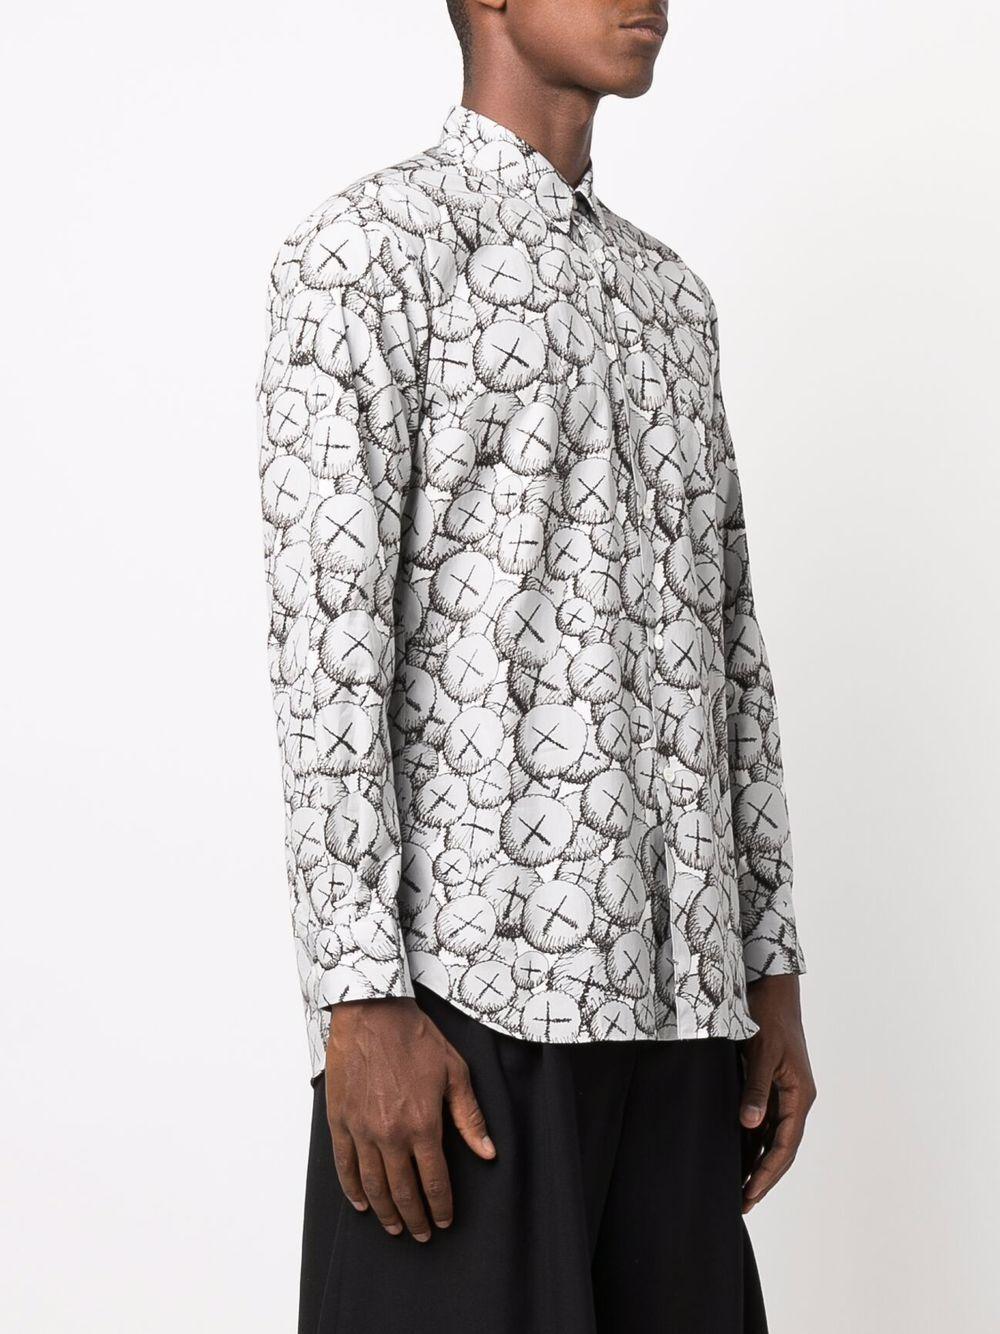 woven shirt man white in cotton COMME DES GARÇONS SHIRT | Shirts | FH-B027-W211